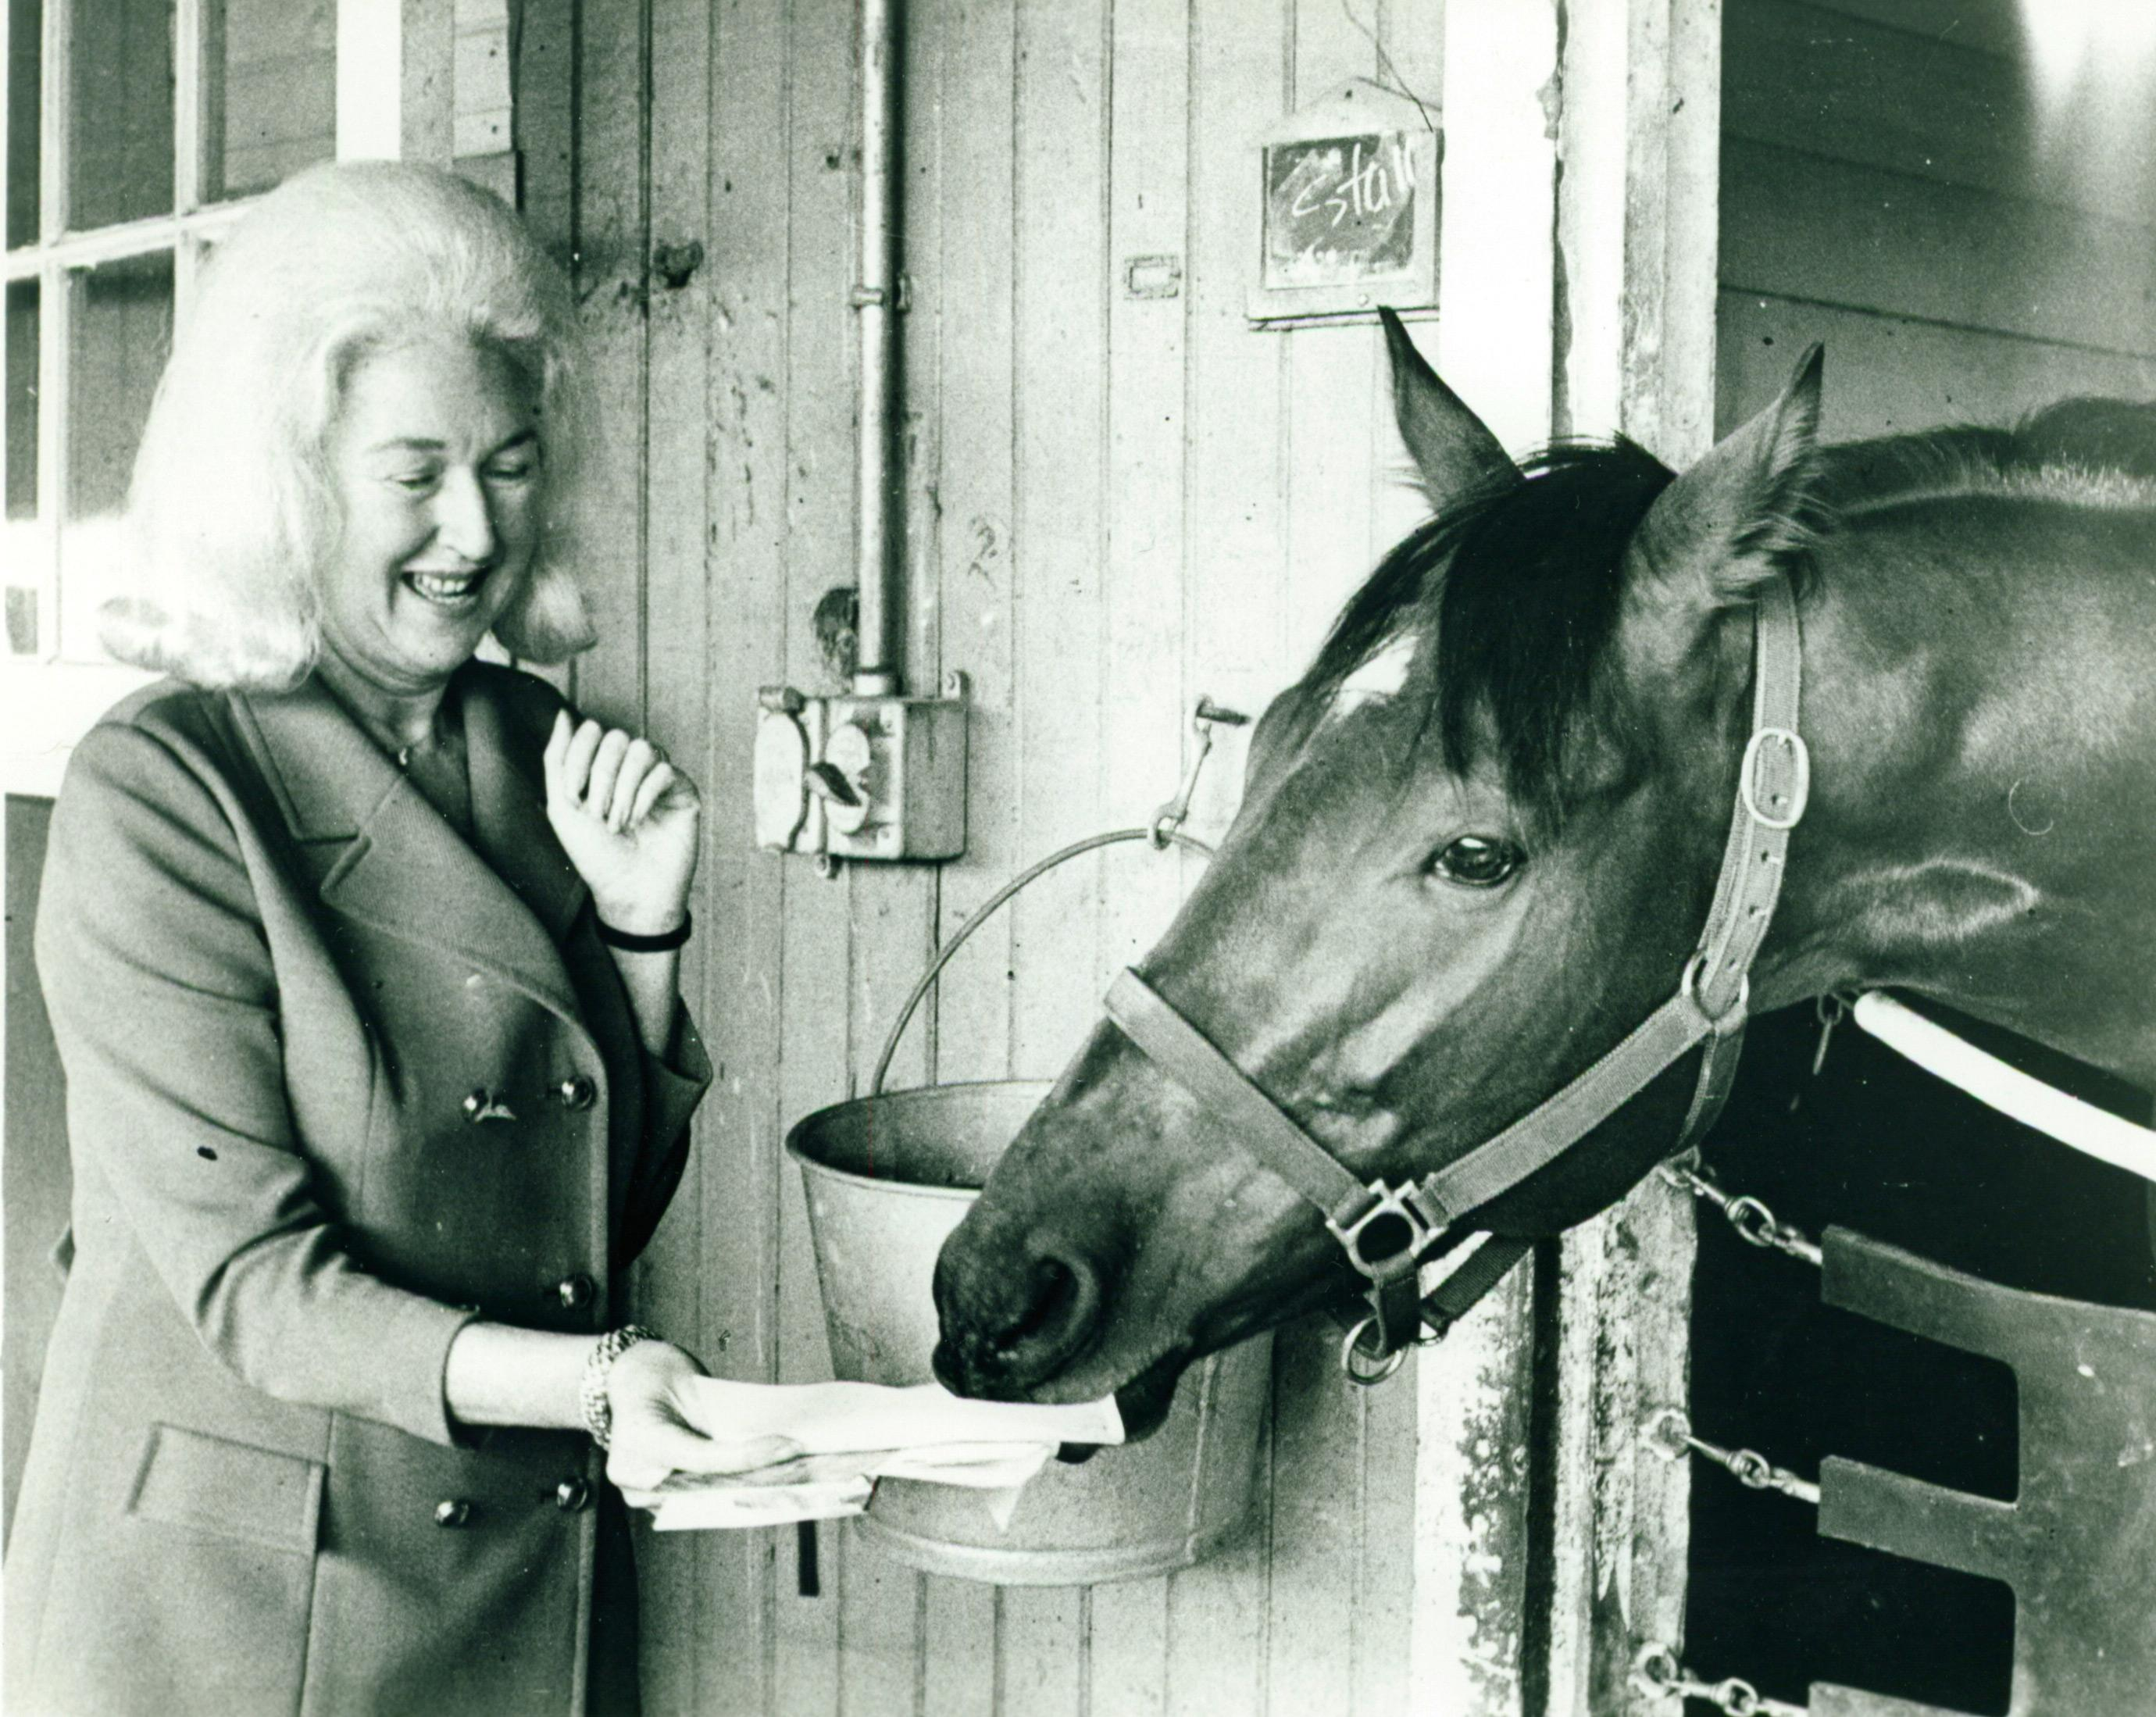 Canonero with Sandy Hirsch, wife of trainer Buddy Hirsch.